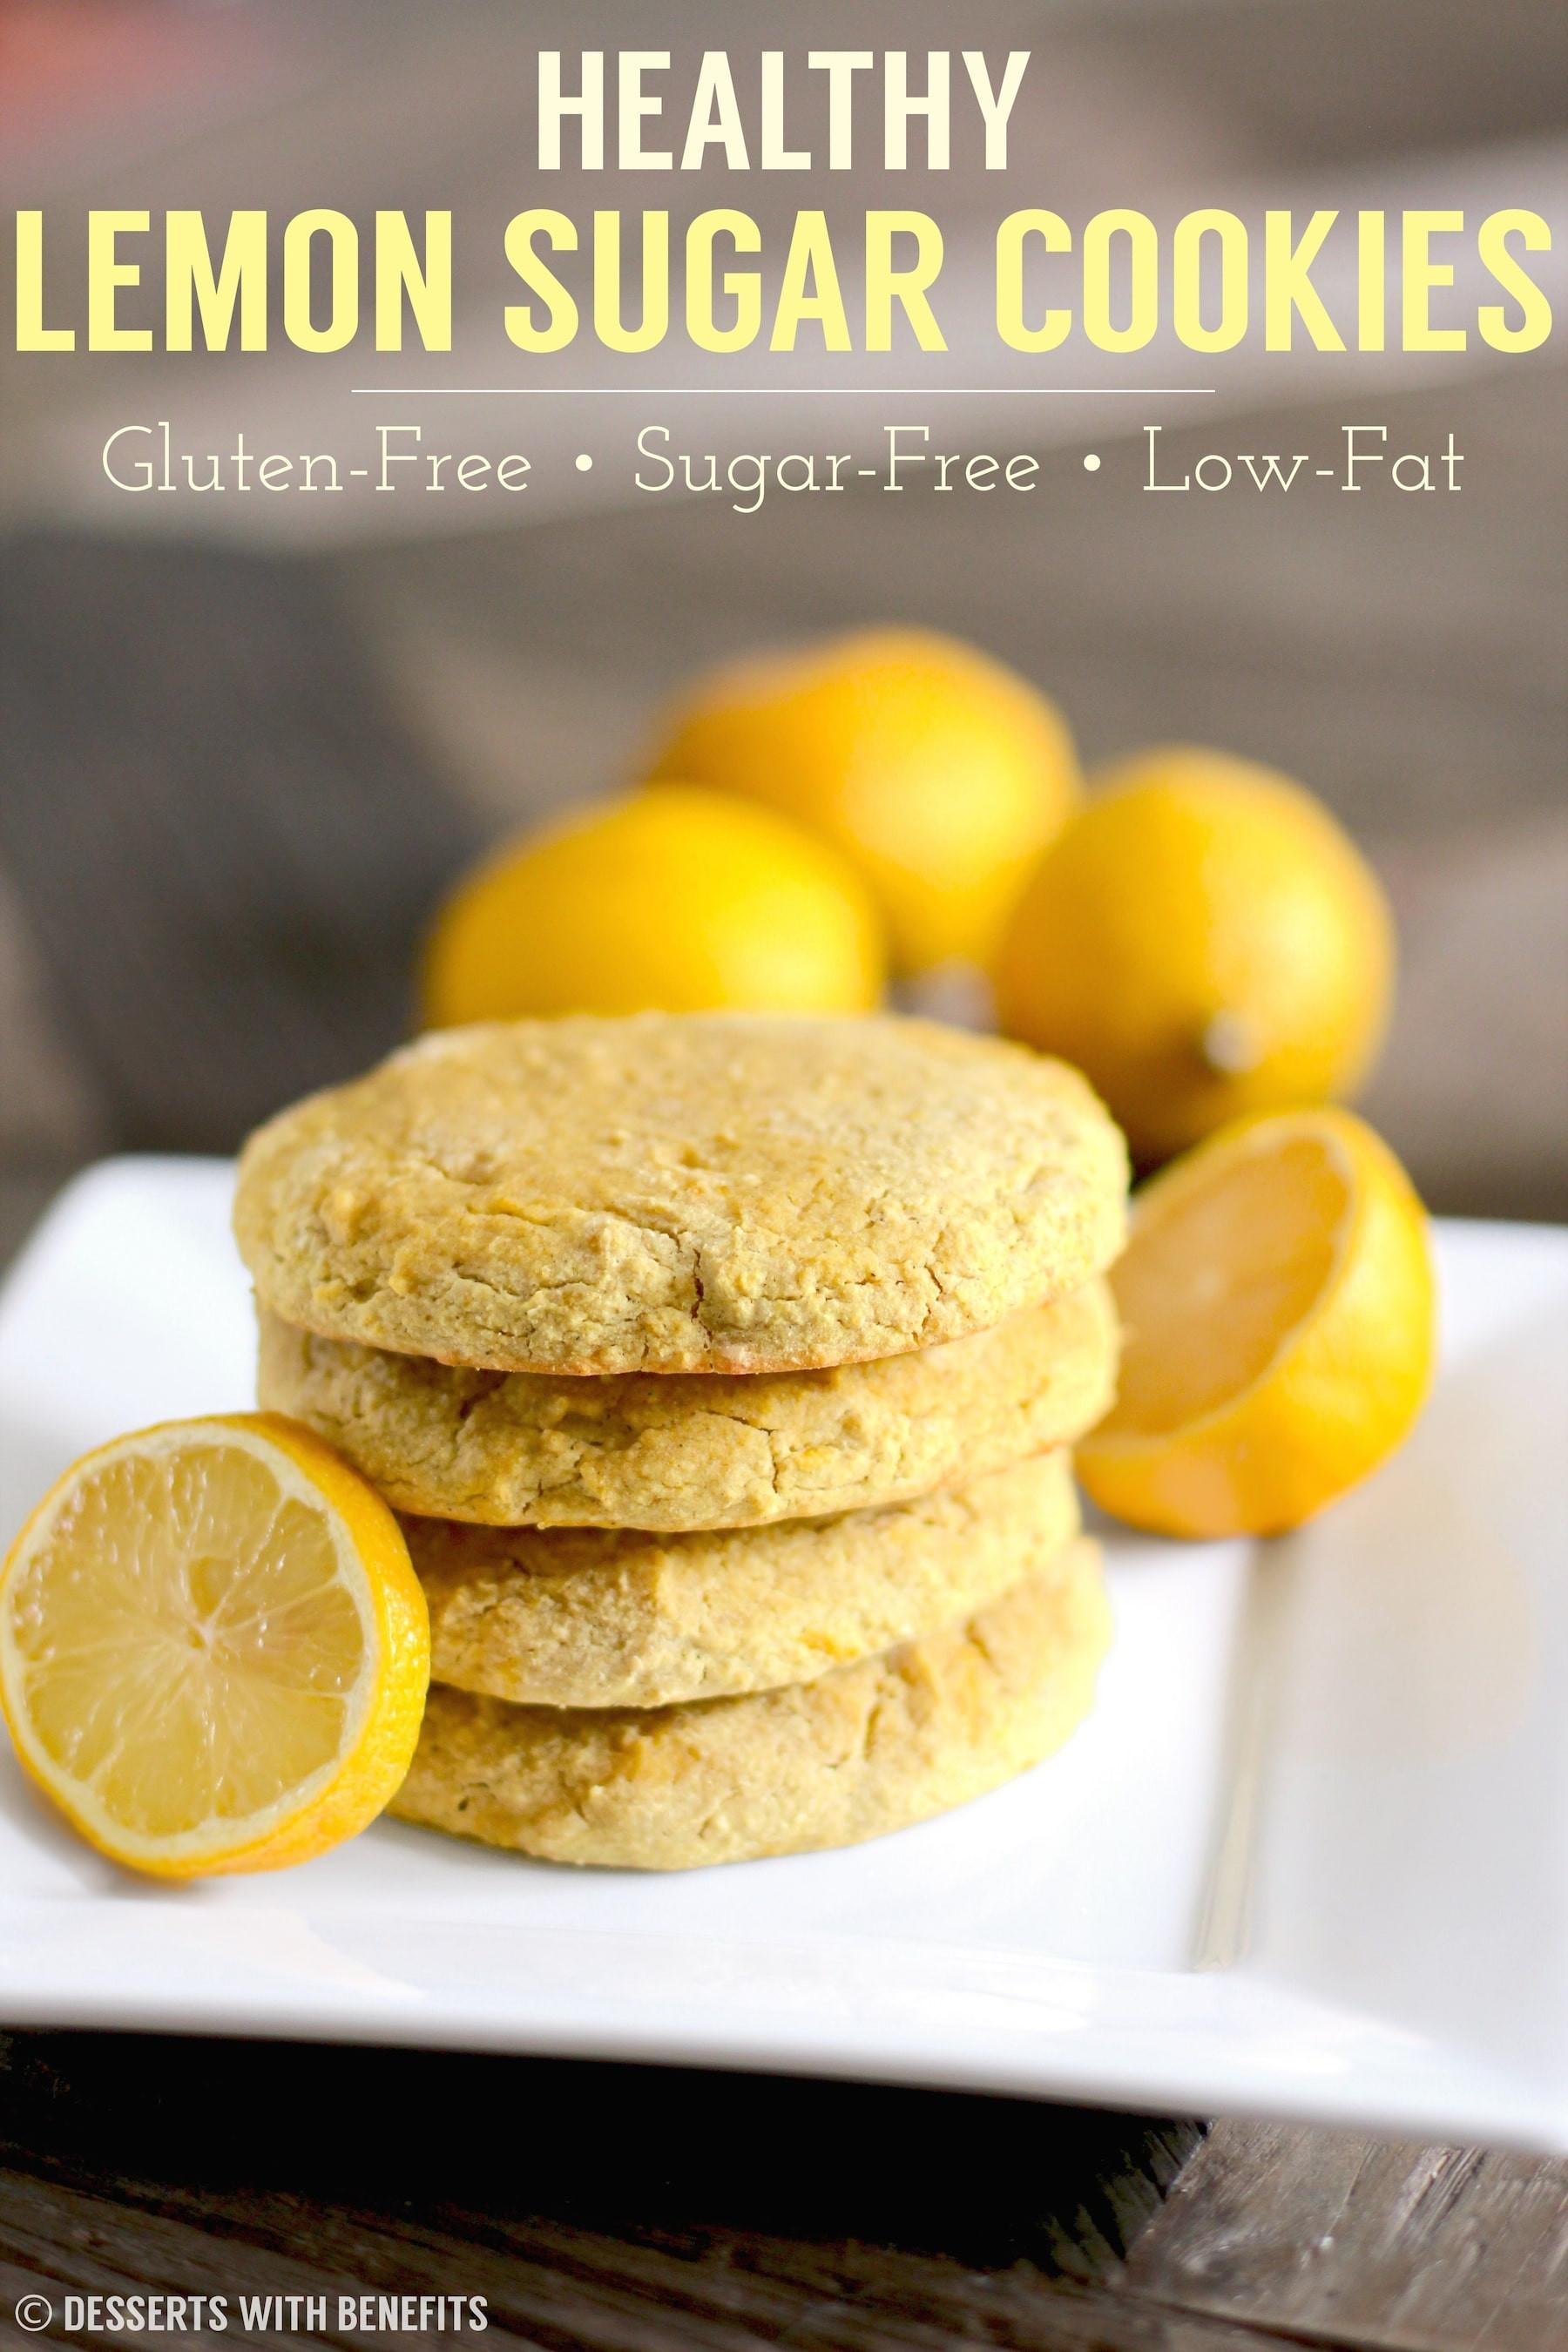 Gluten Free Dairy Free Sugar Free Dessert Recipes  Soft Chewy Lemon Sugar Cookies Recipe